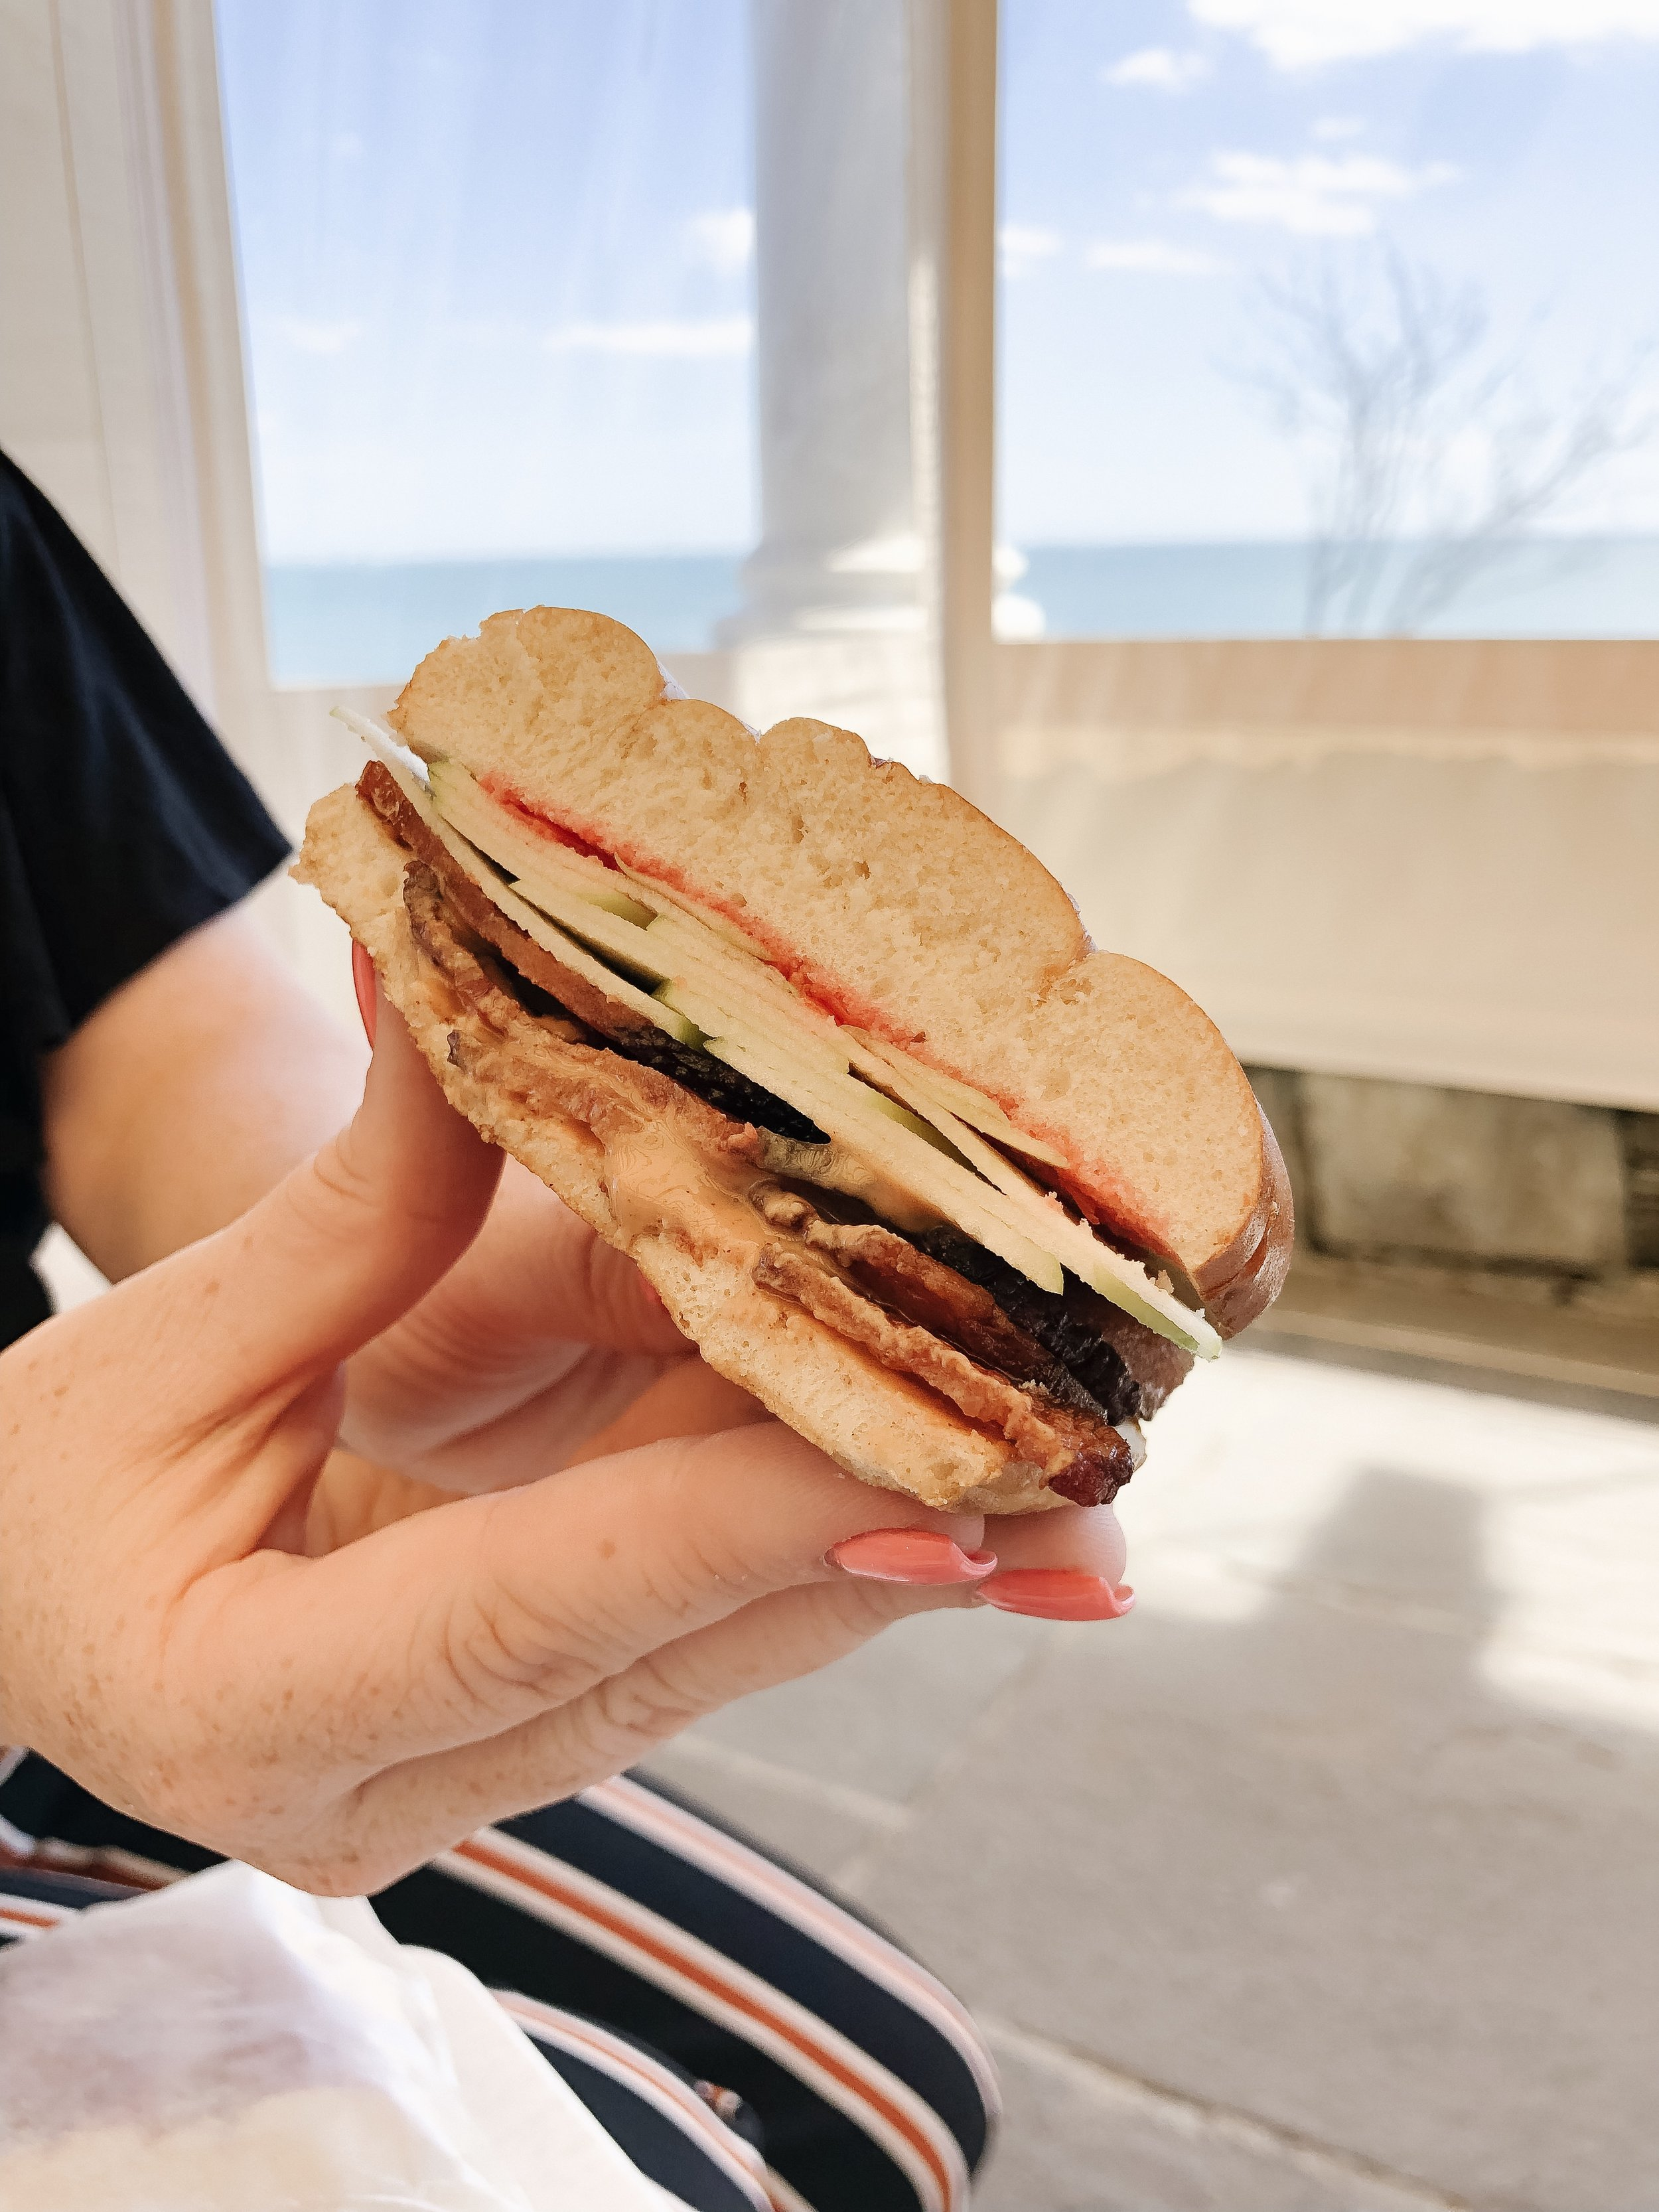 The Heavyweight - pretzel roll, crunchy peanut butter, bacon, cherry jam, and sliced apples